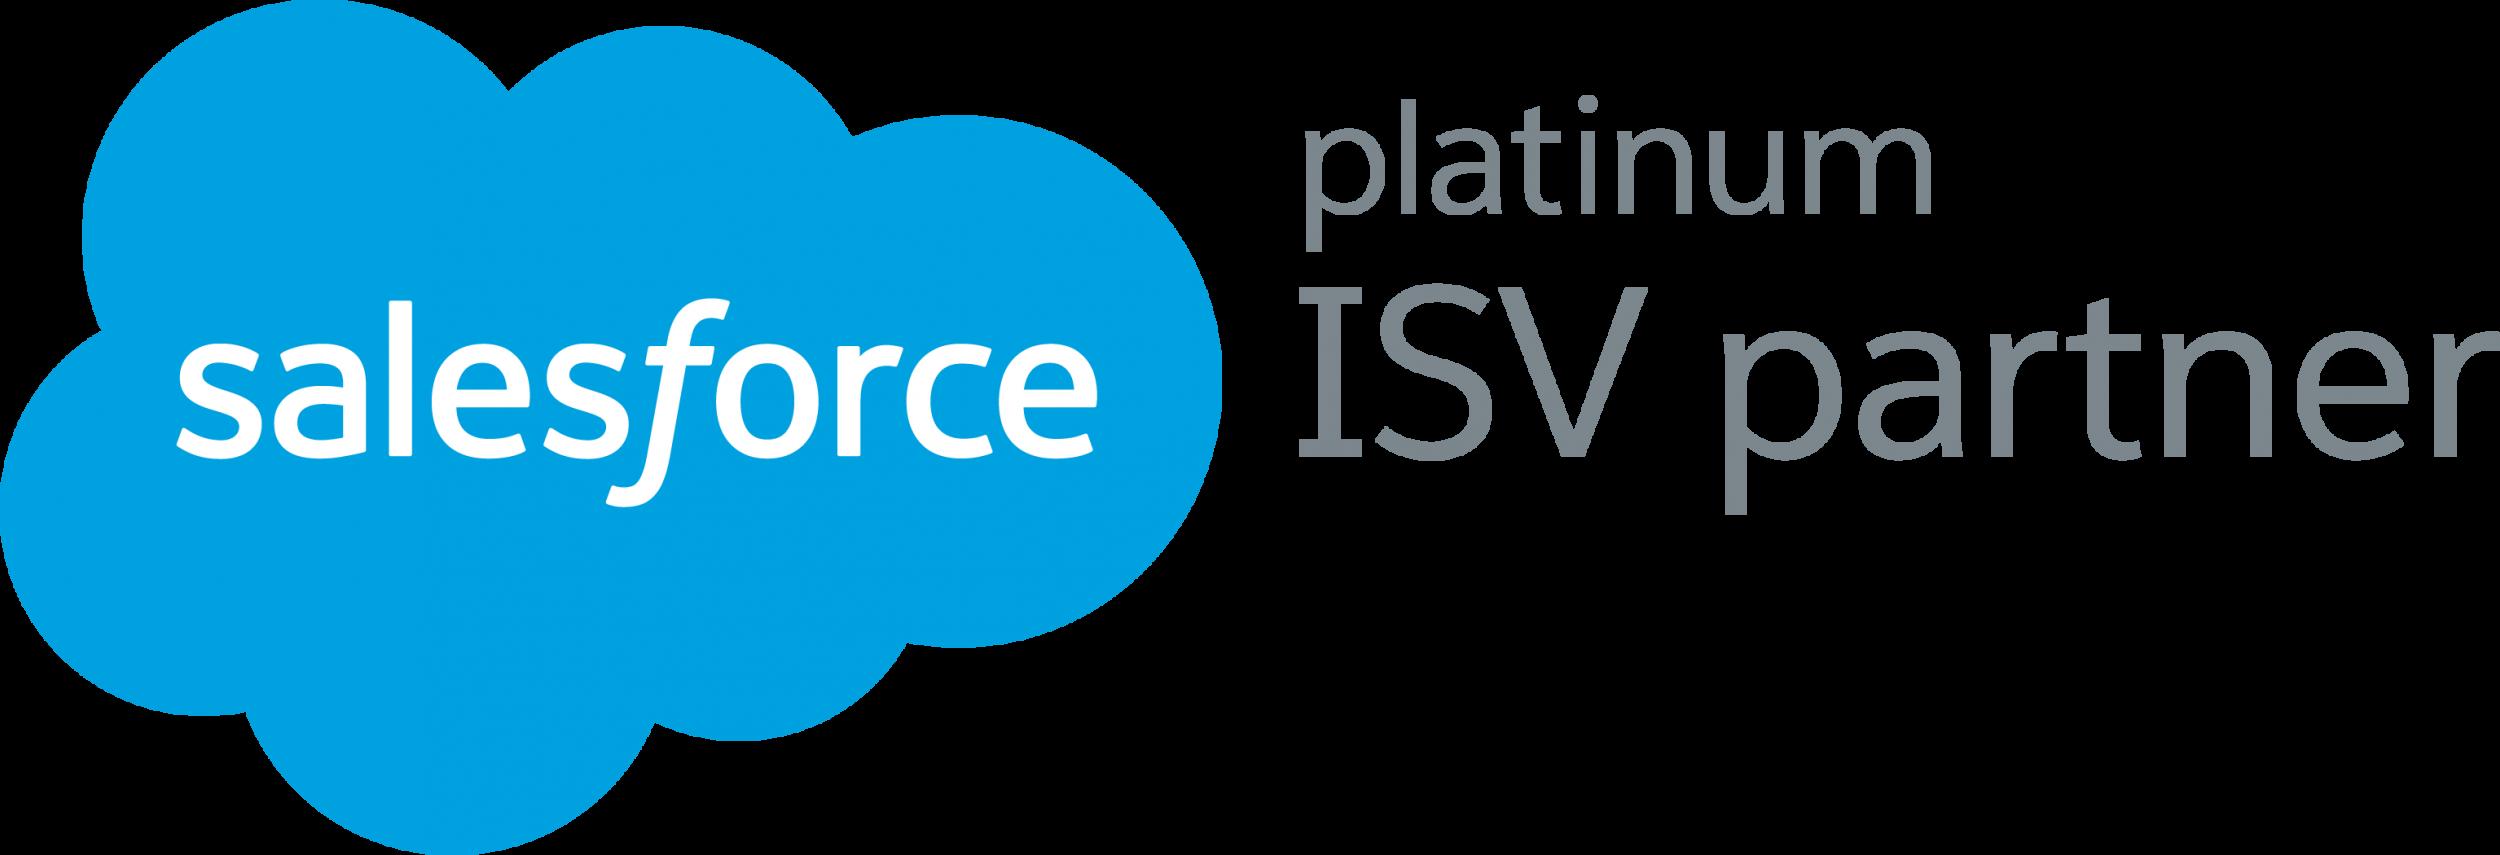 Salesforce: Partners